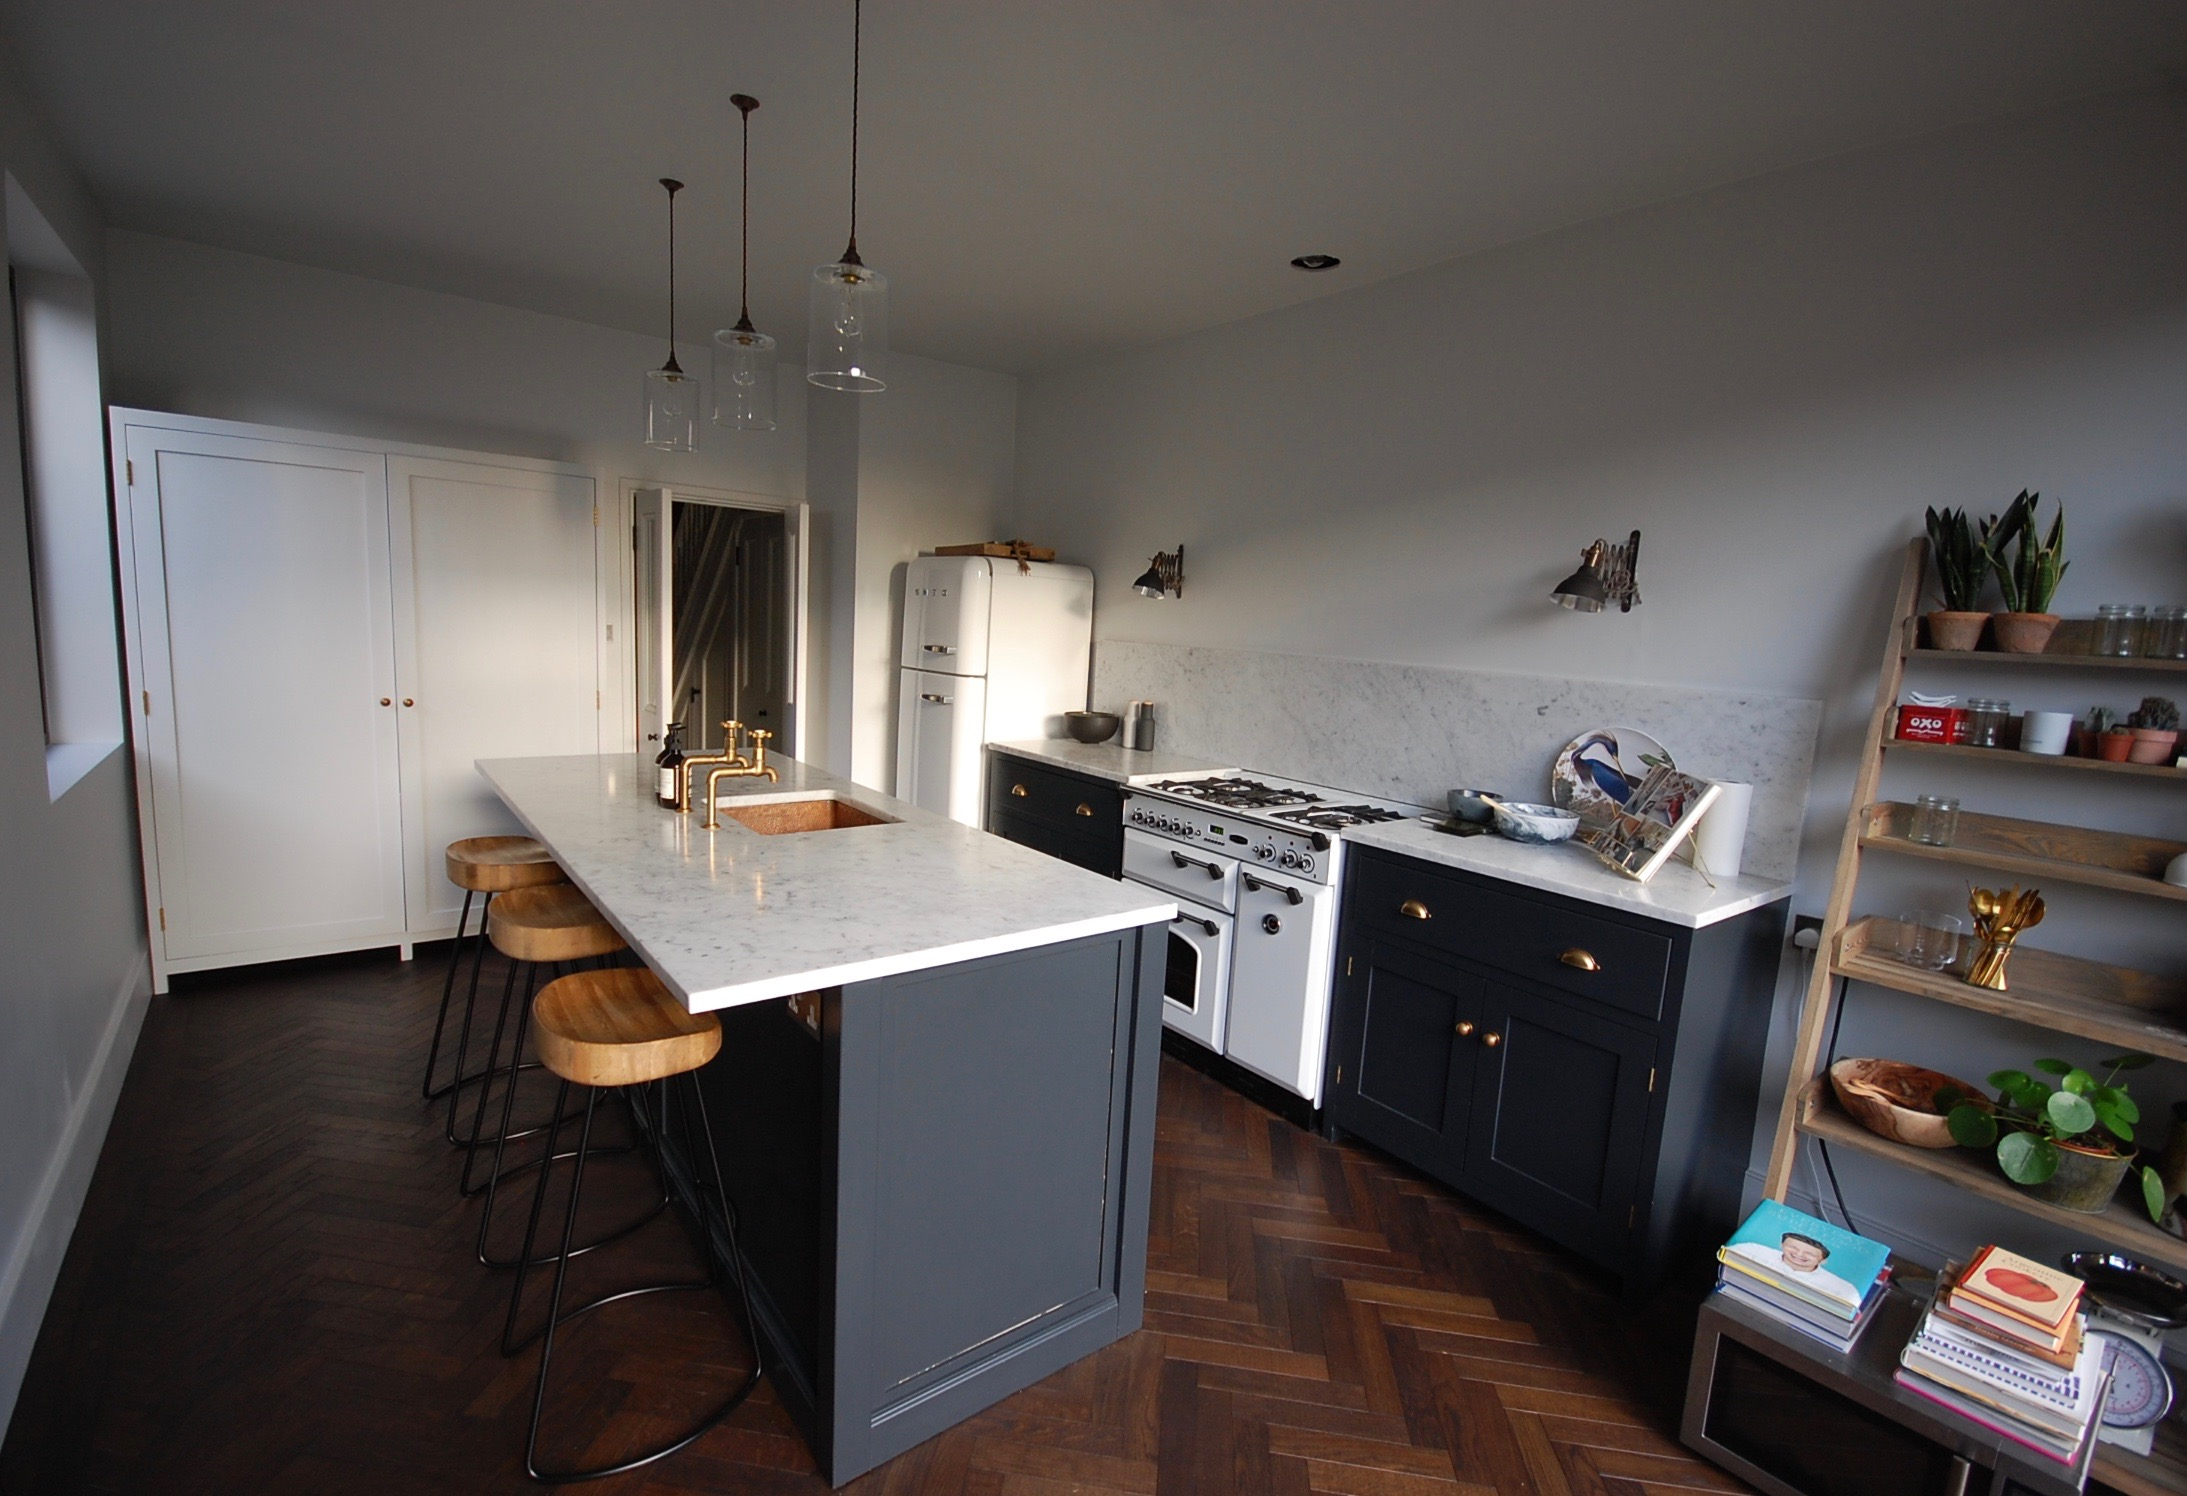 Grain_Bespoke_Furniture_Kitchen Larder_1.jpg